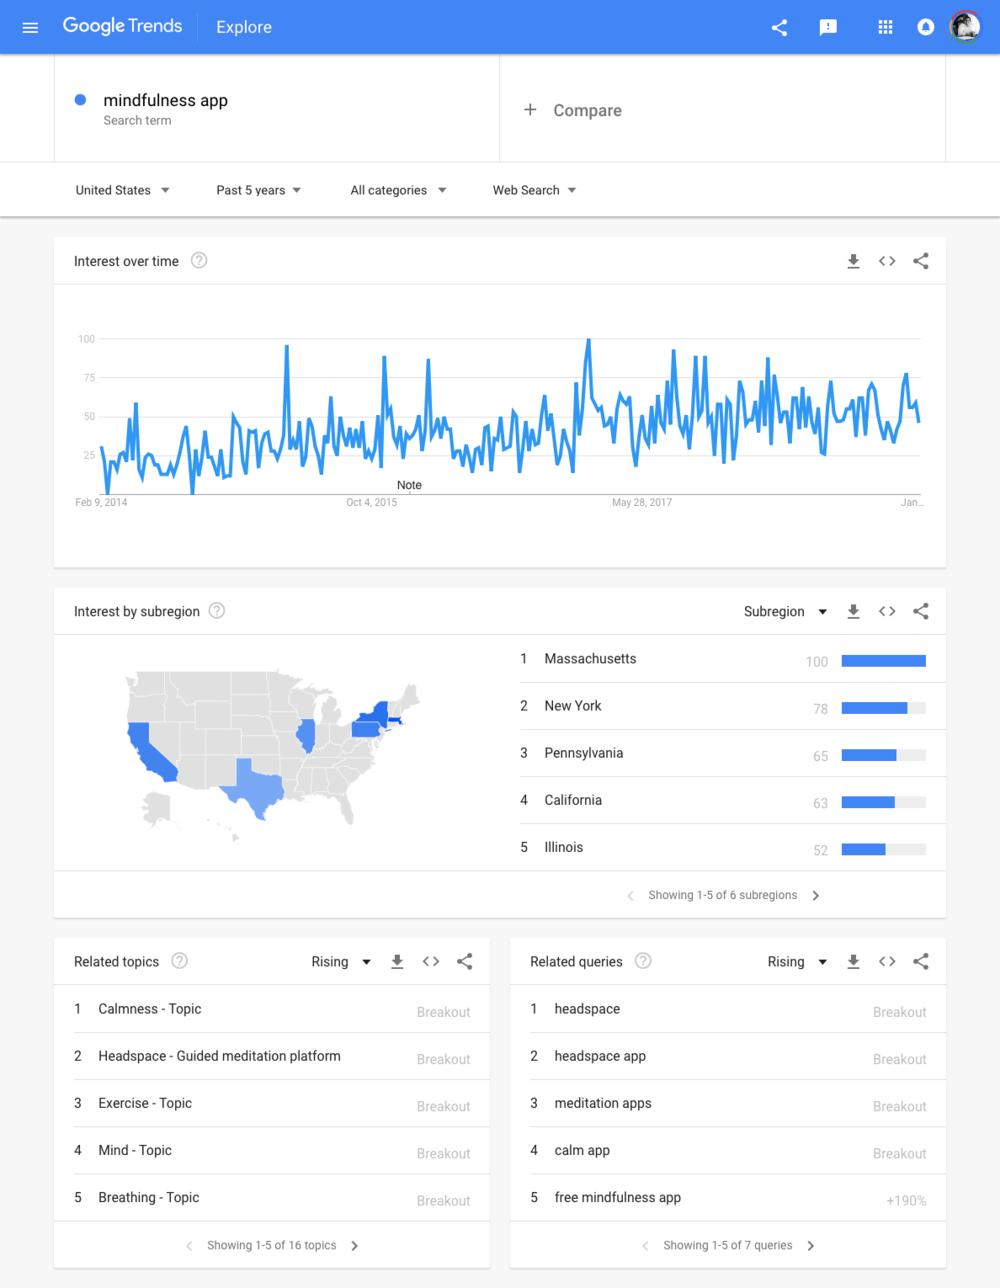 screencapture-trends-google-trends-explore-2019-02-07-16_01_55.png